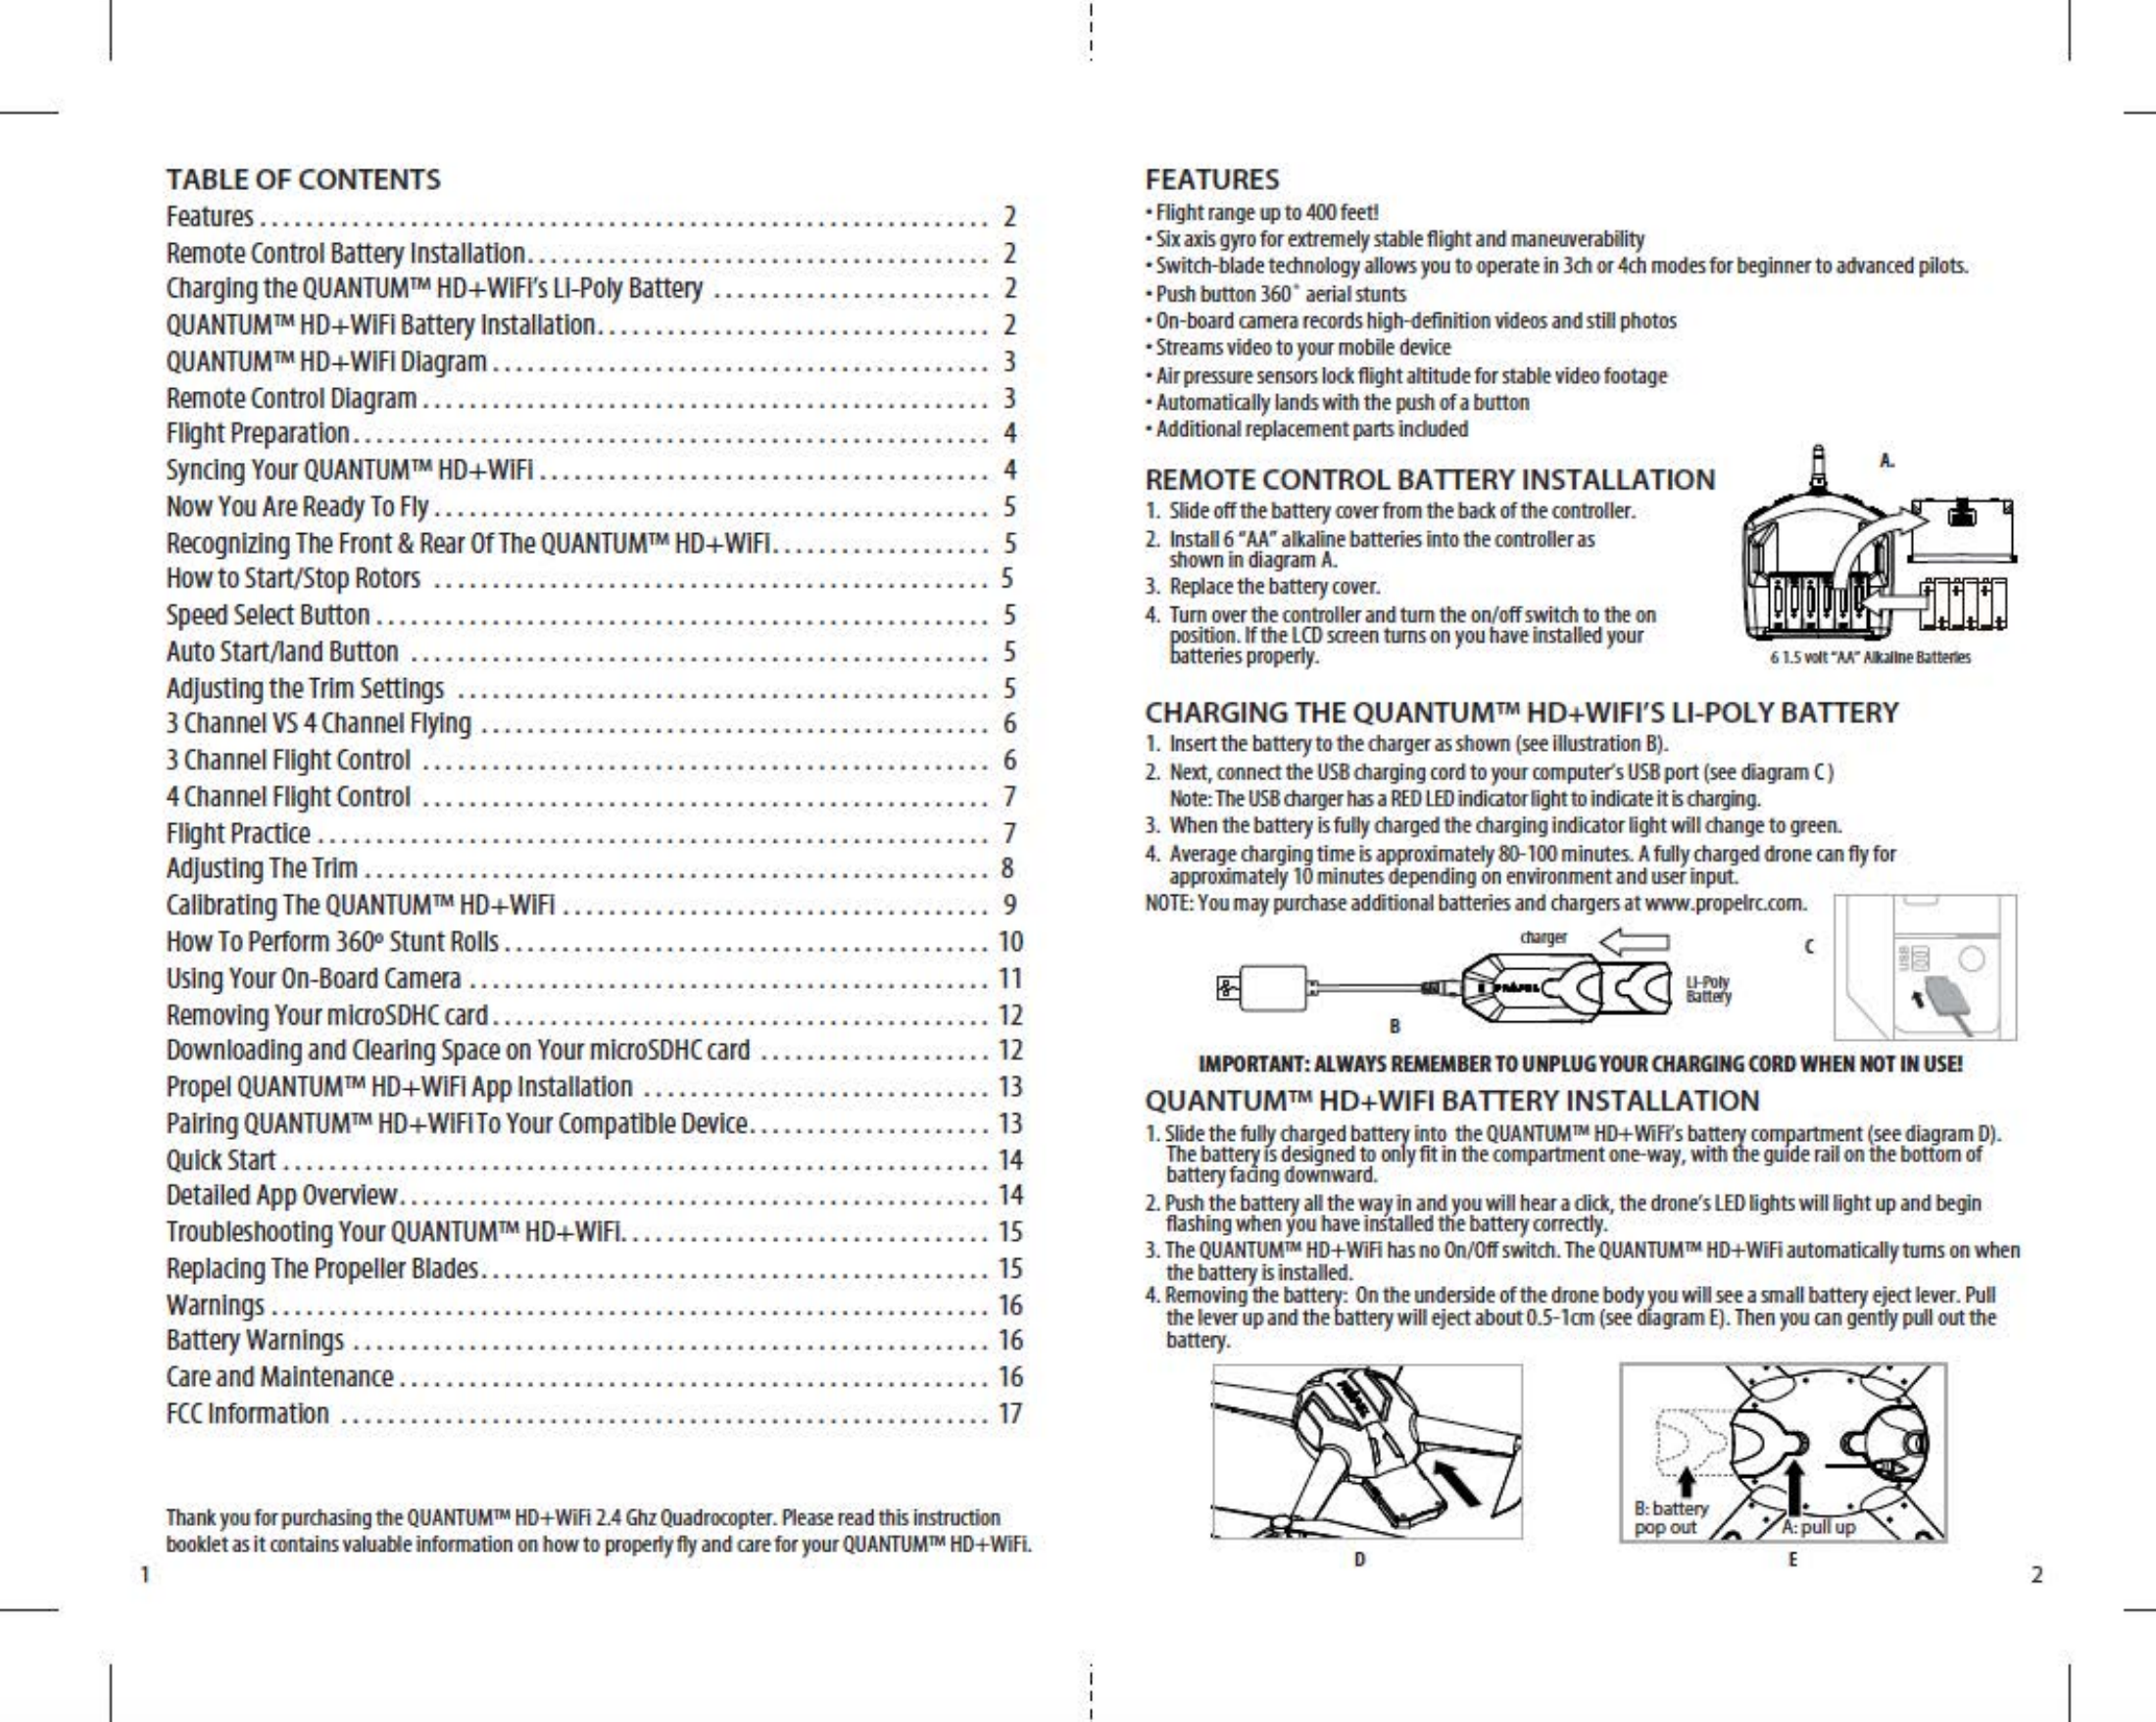 Asian Express Pl 1750r Hd Video Drone Quantum Wifi Alkaline Battery Diagram User Manual